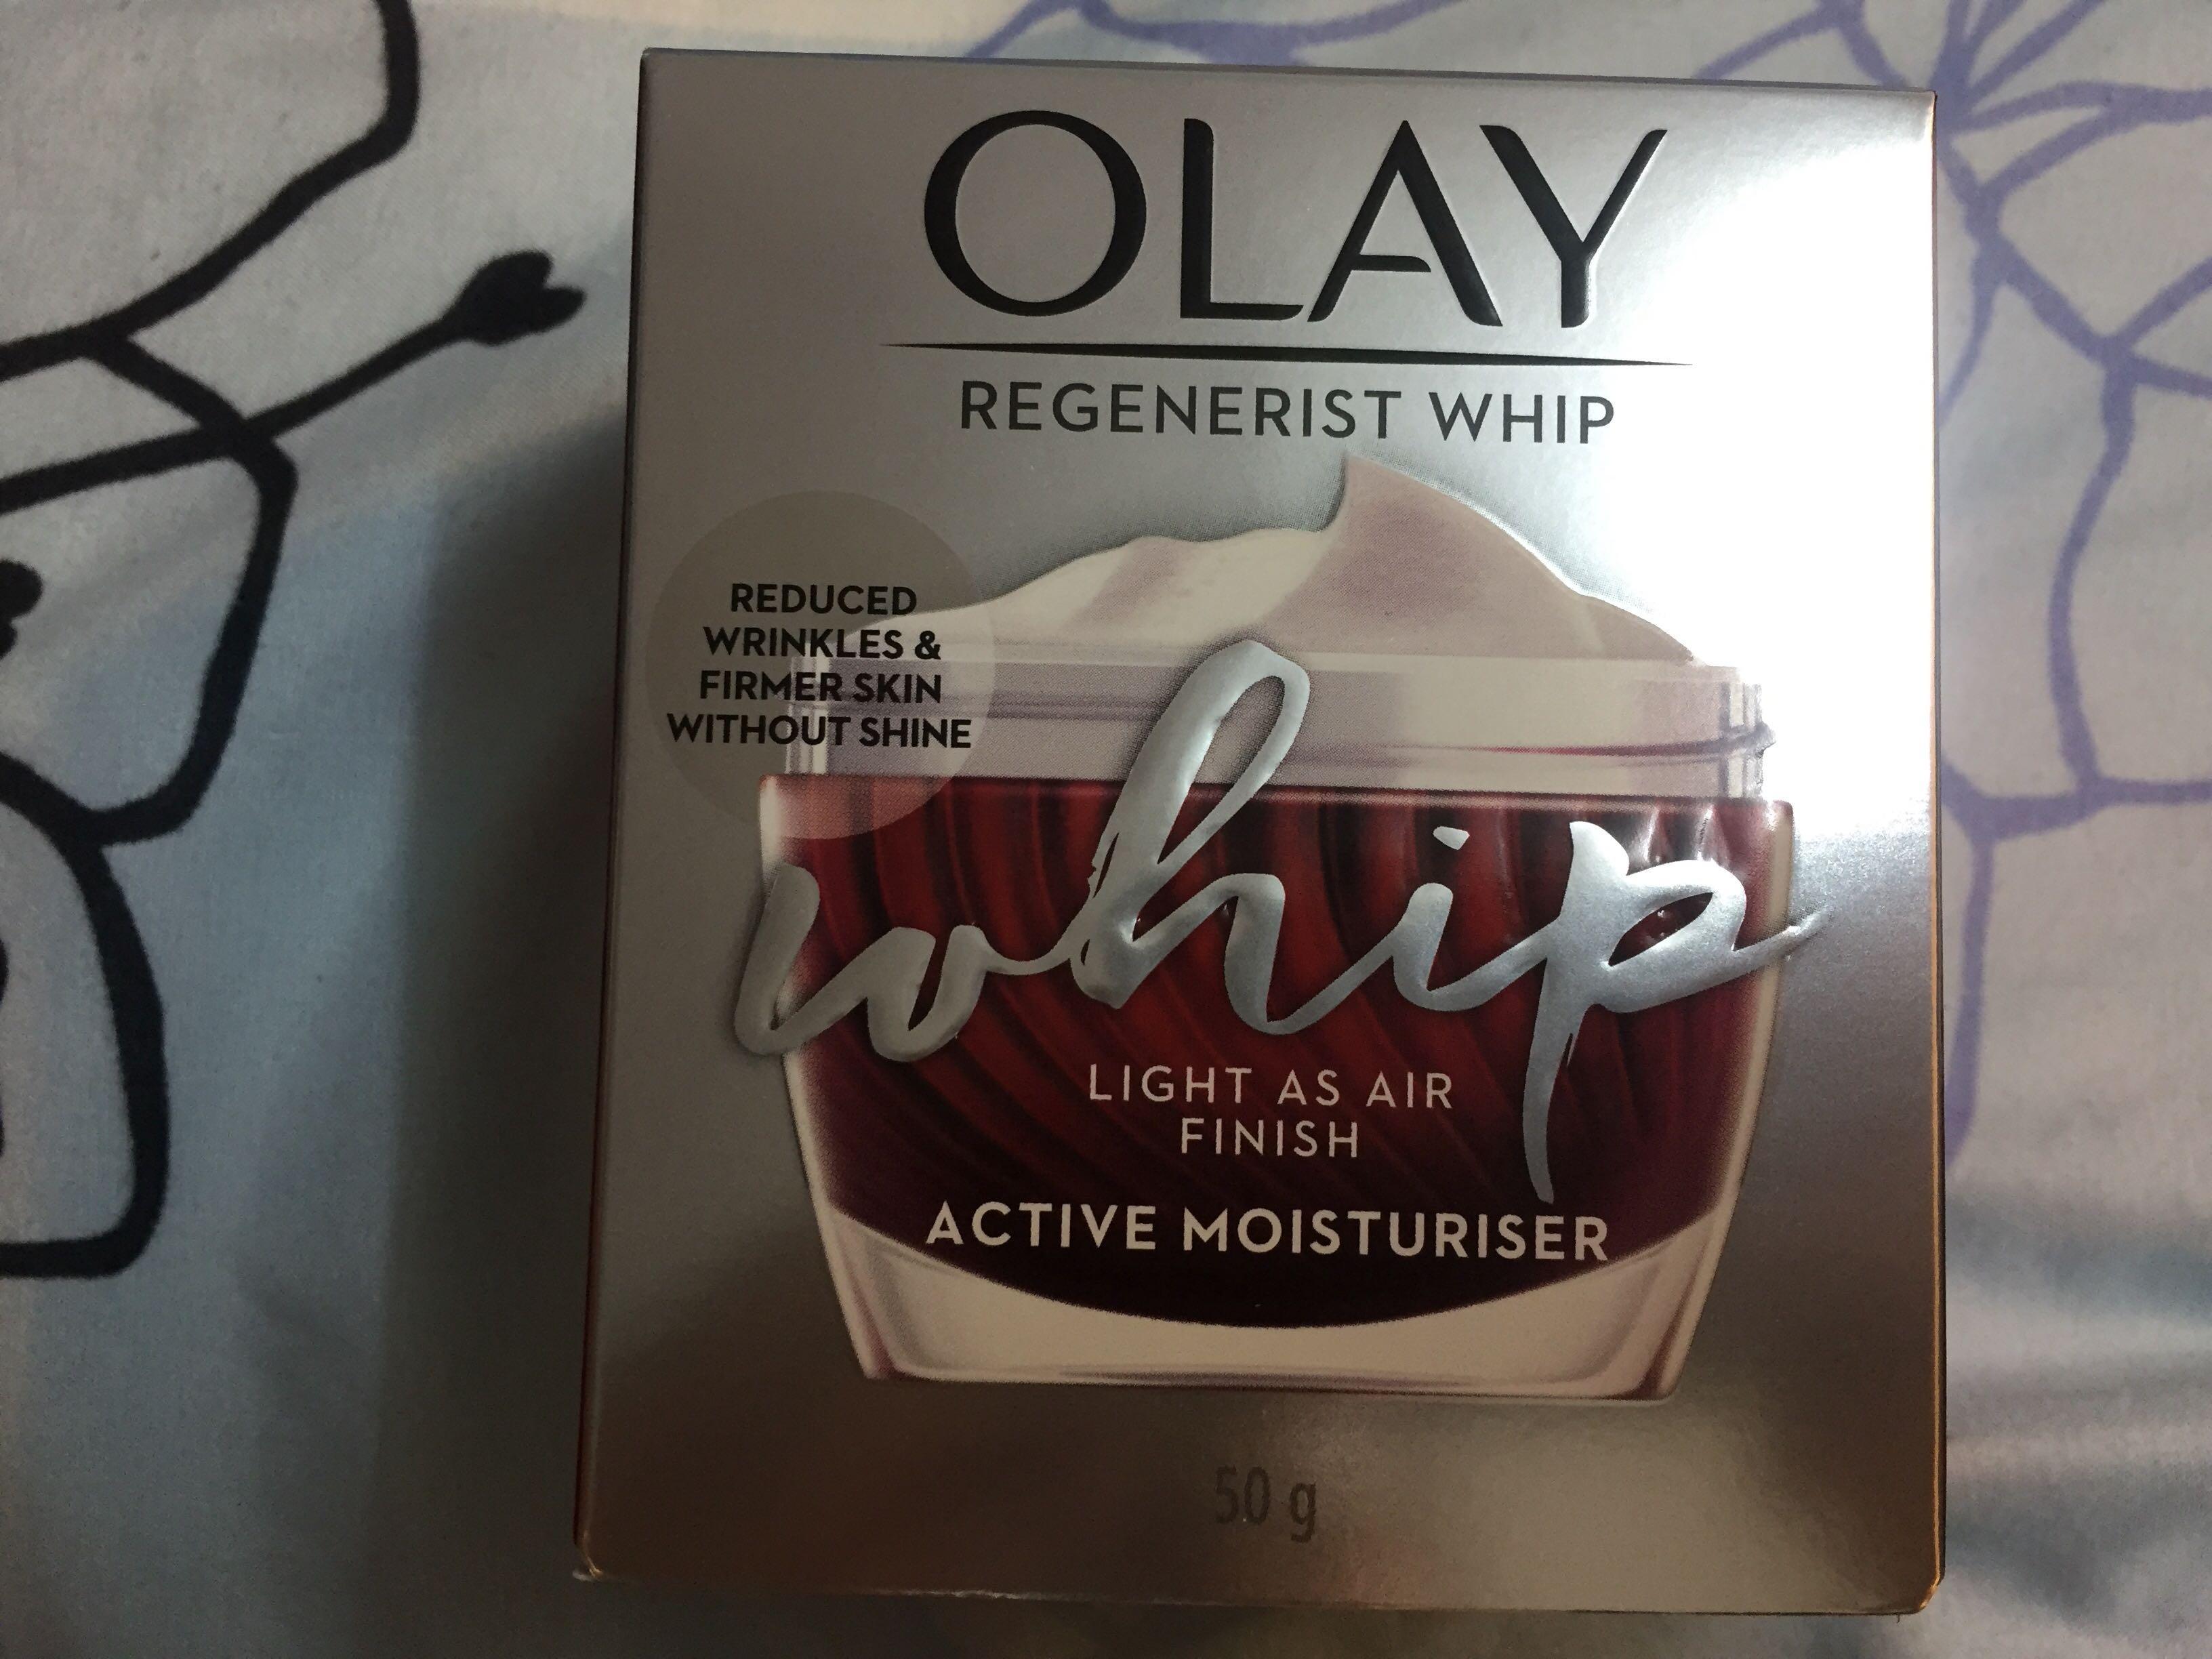 Olay Regenerist Whip